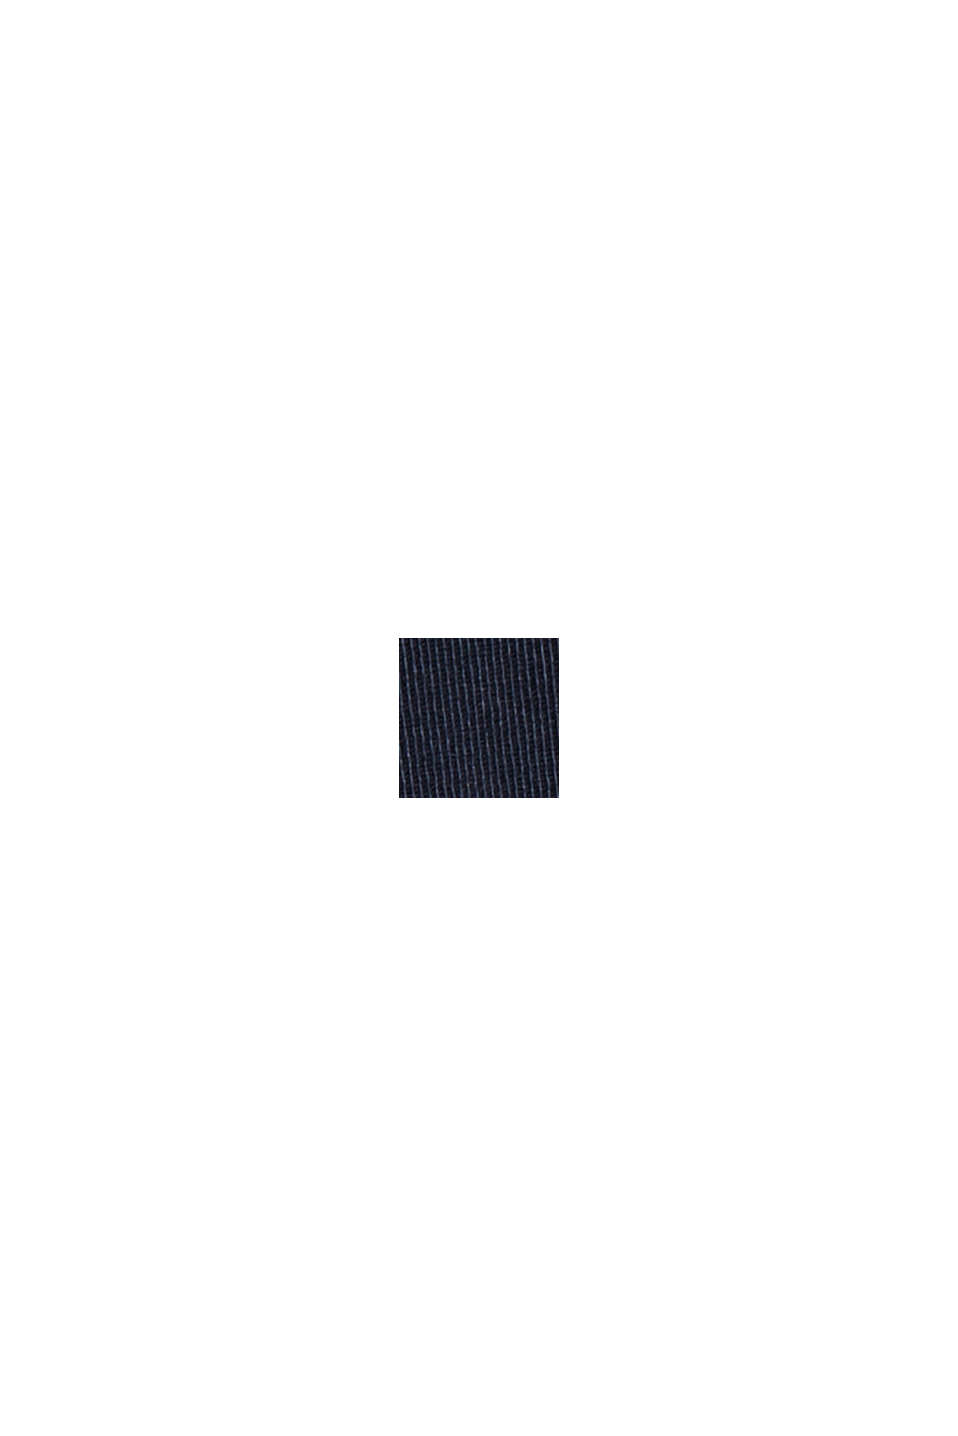 Kalhoty chino z bio bavlny s kroužkem na klíče, NAVY, swatch